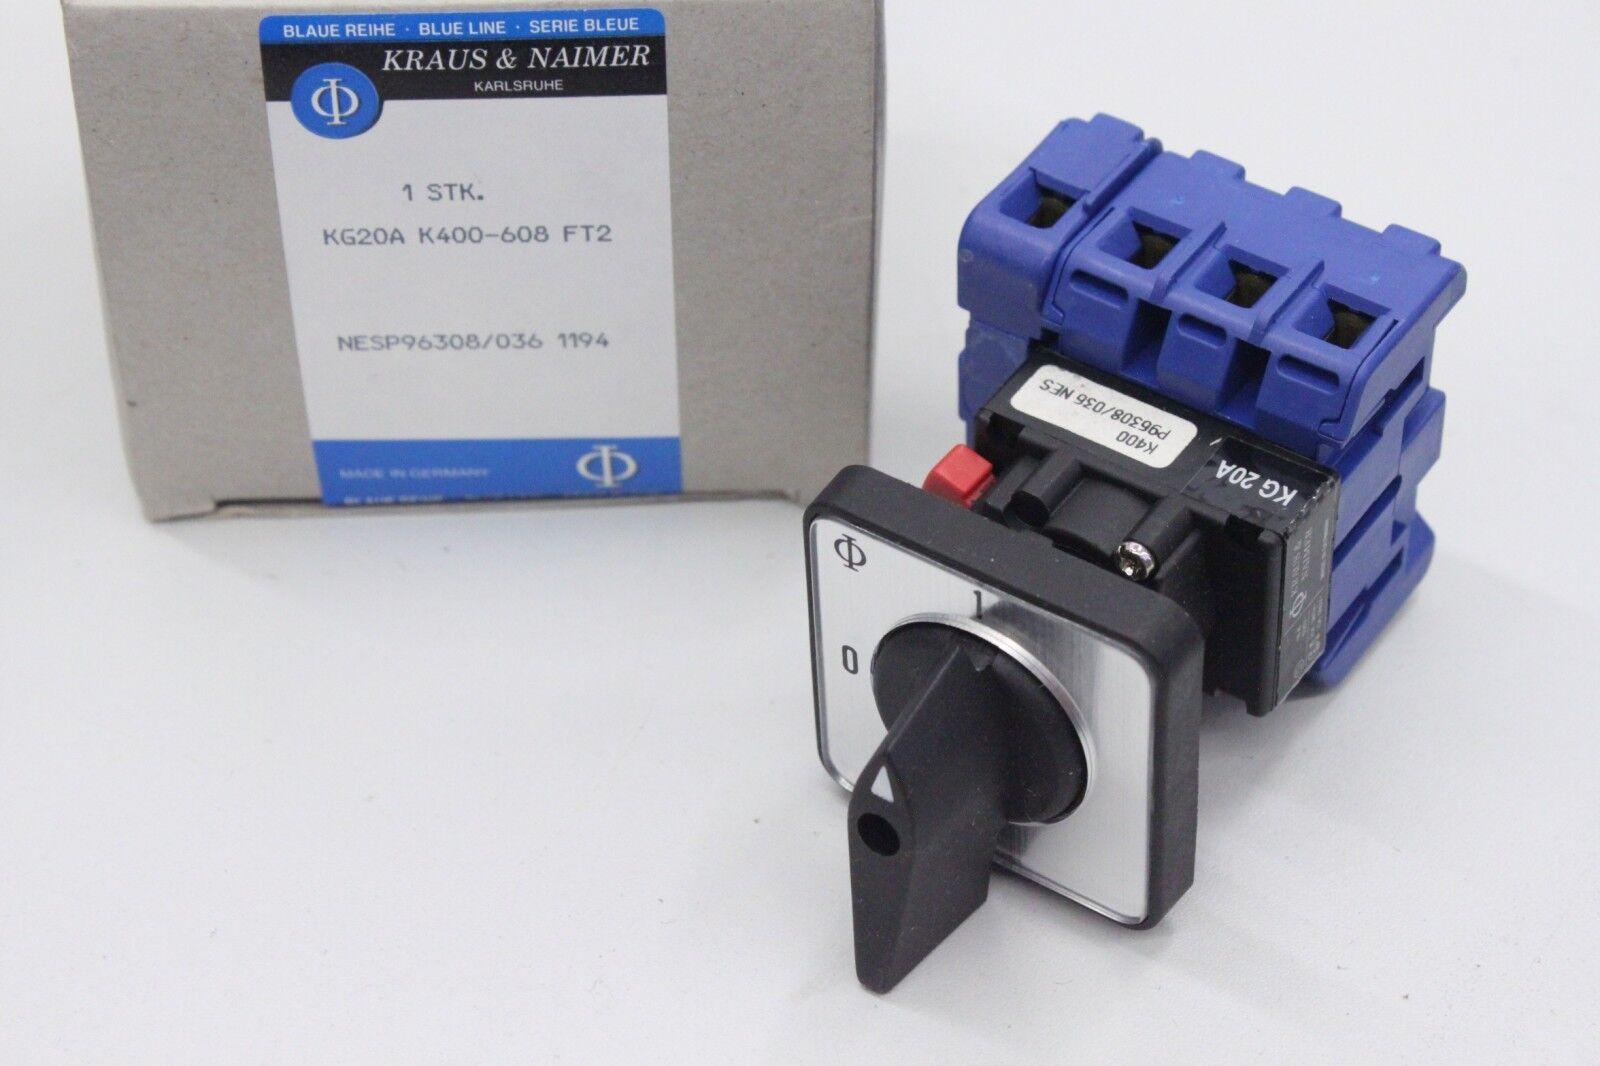 KRAUS/&NAIMER KG20A K400 608 FT2 Schalter Hauptschalter KG20AK400-608FT2 OVP